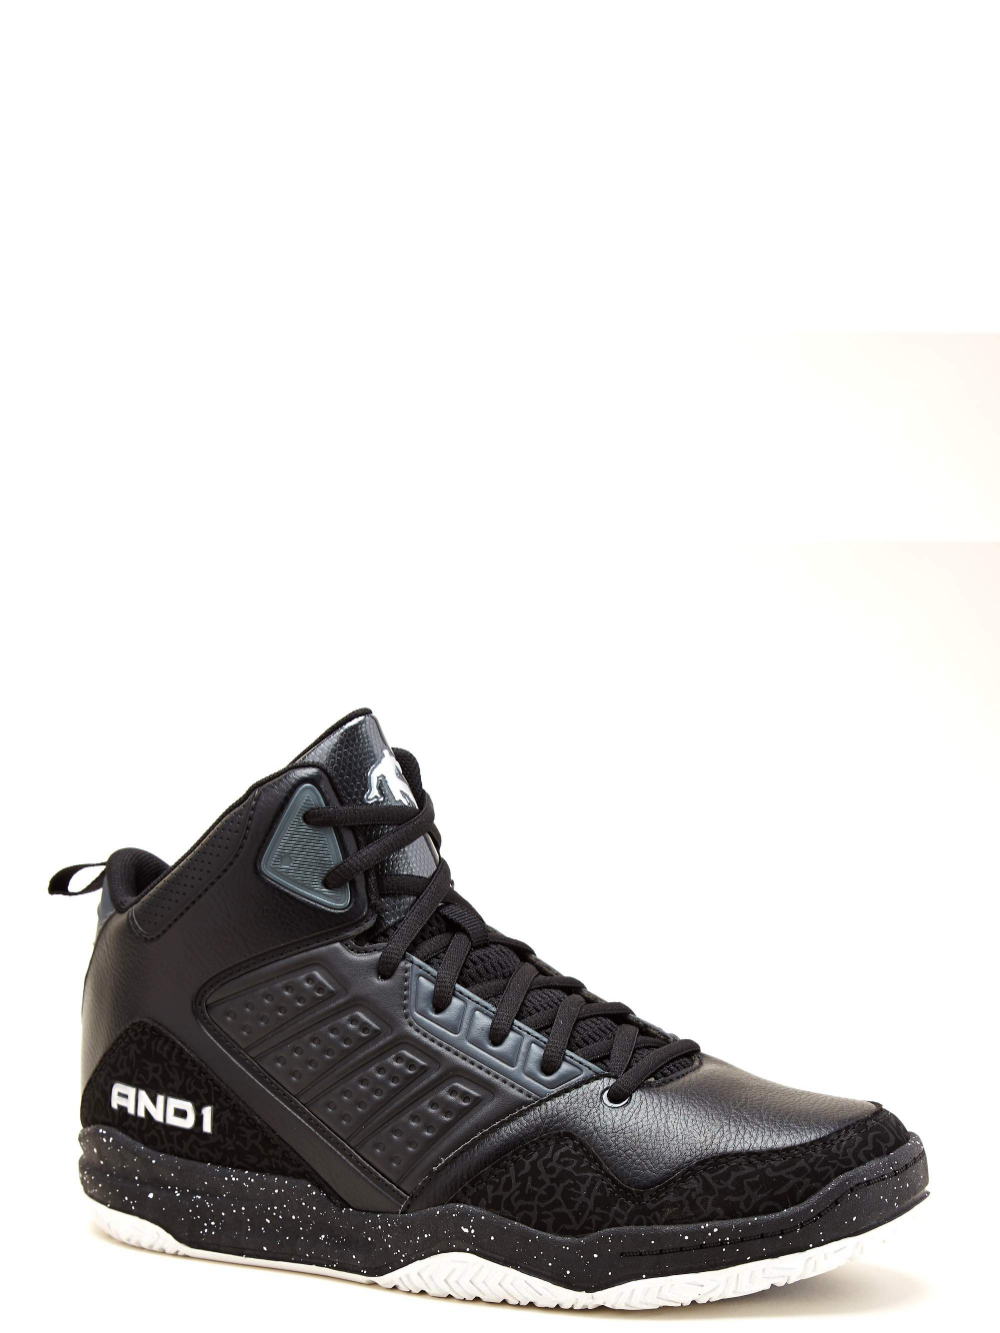 walmart womens basketball shoes